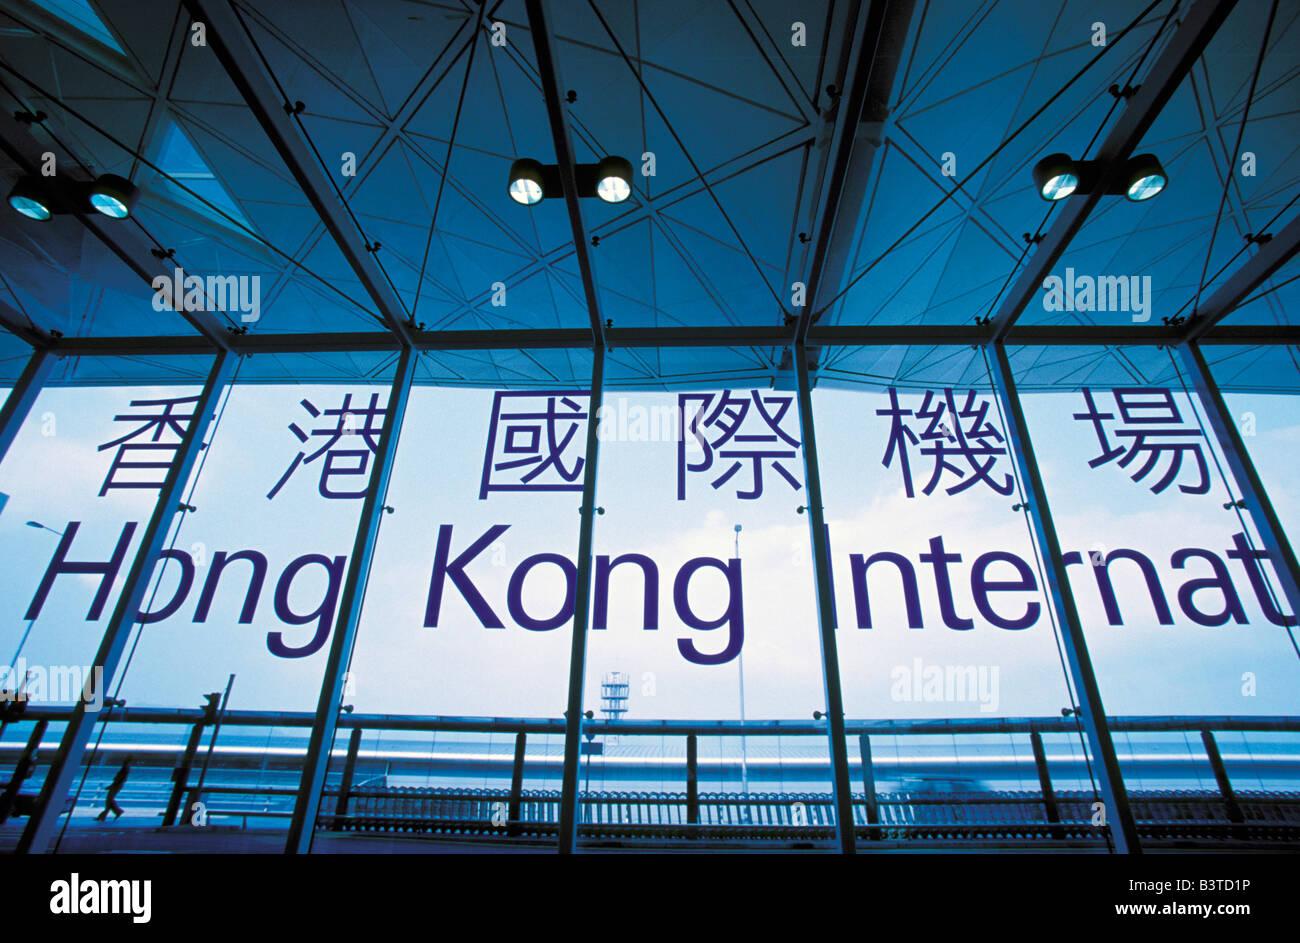 Asia, Hong Kong. Chek Lap Kok Airport. - Stock Image